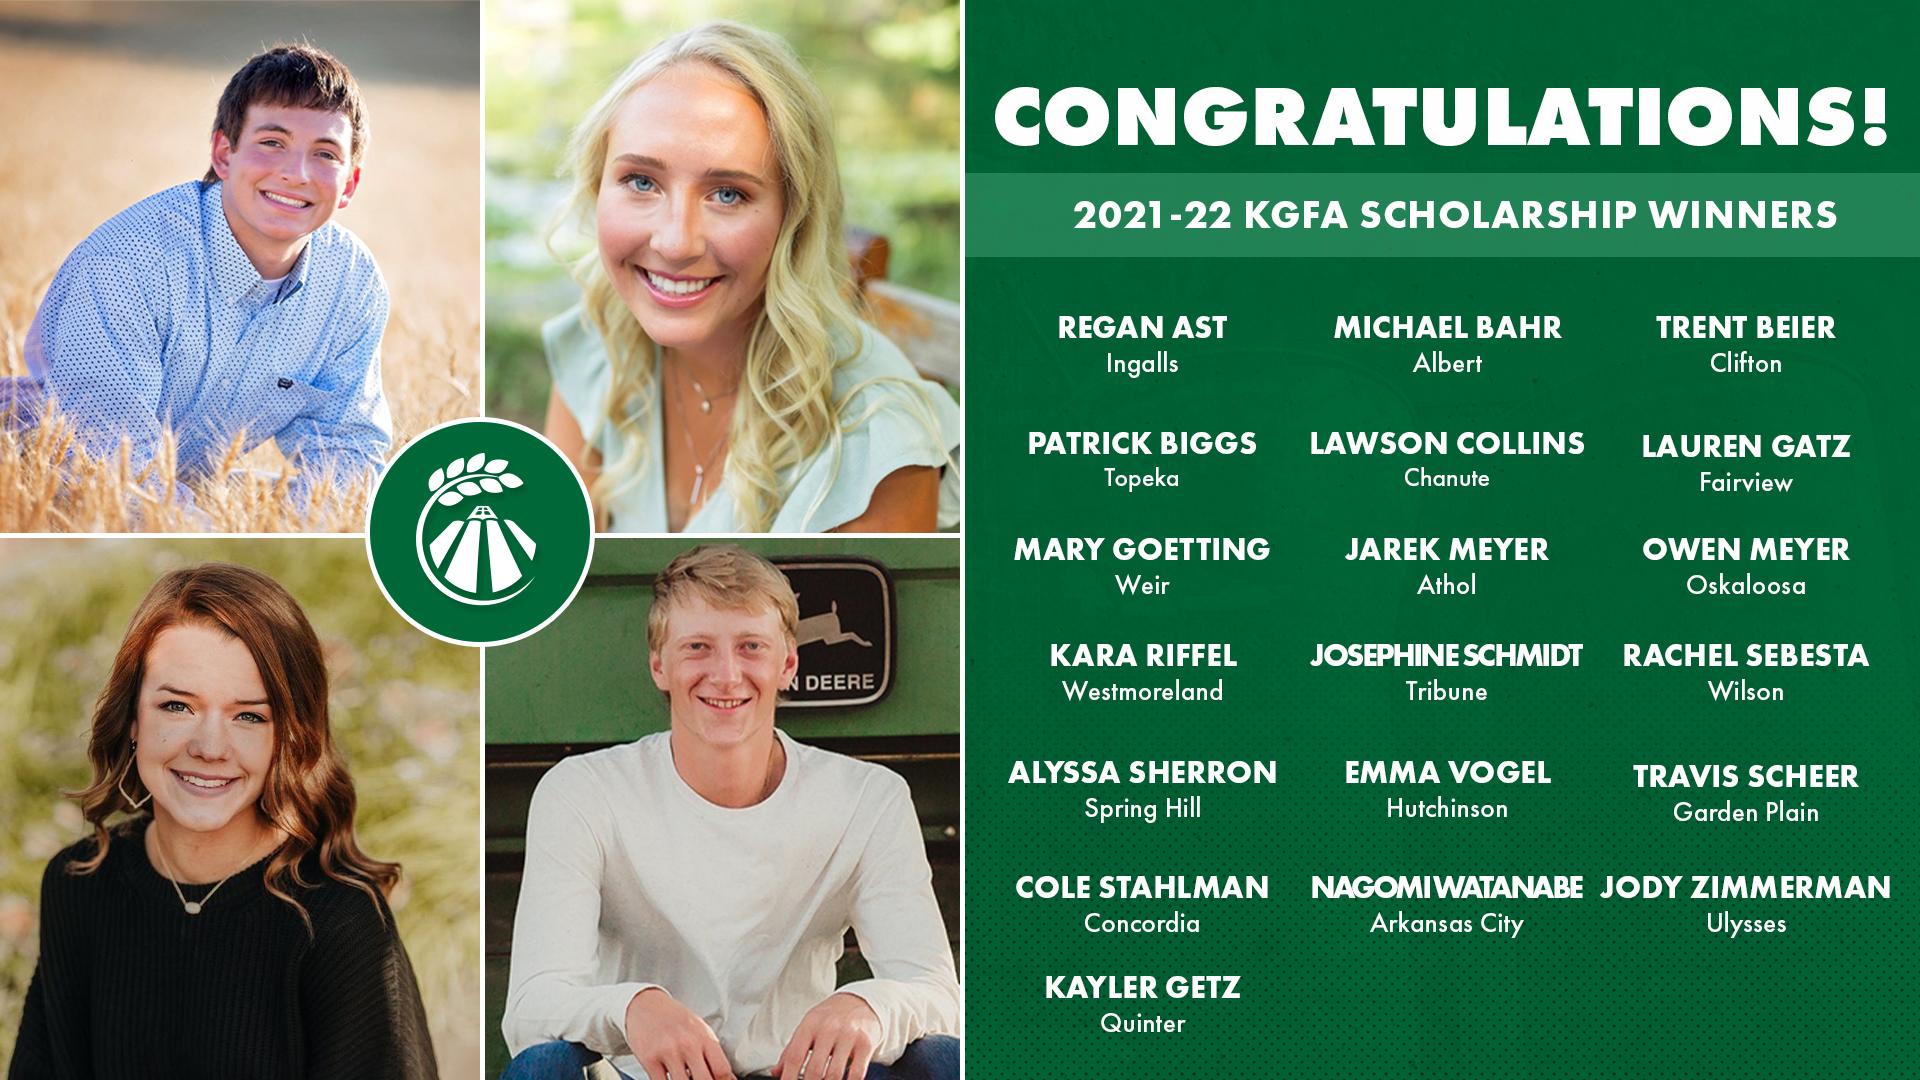 2021 KGFA Scholarship Winners